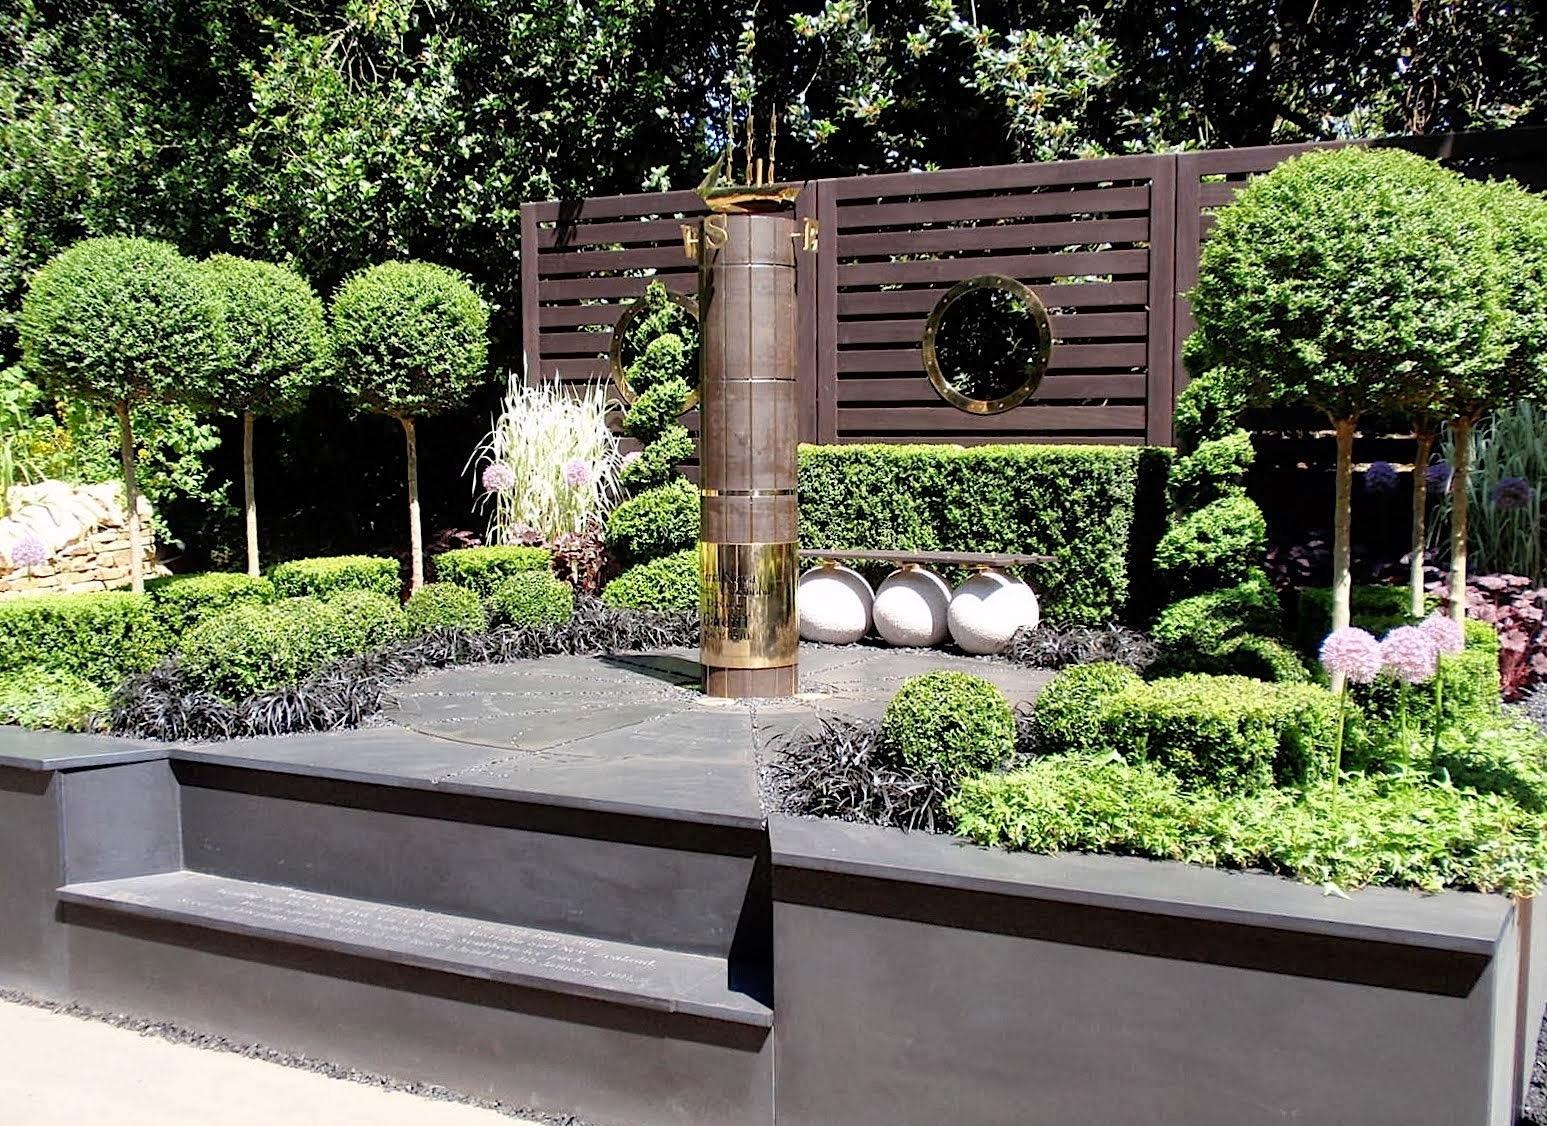 Minimalist Urban Garden (Image 21 of 28)